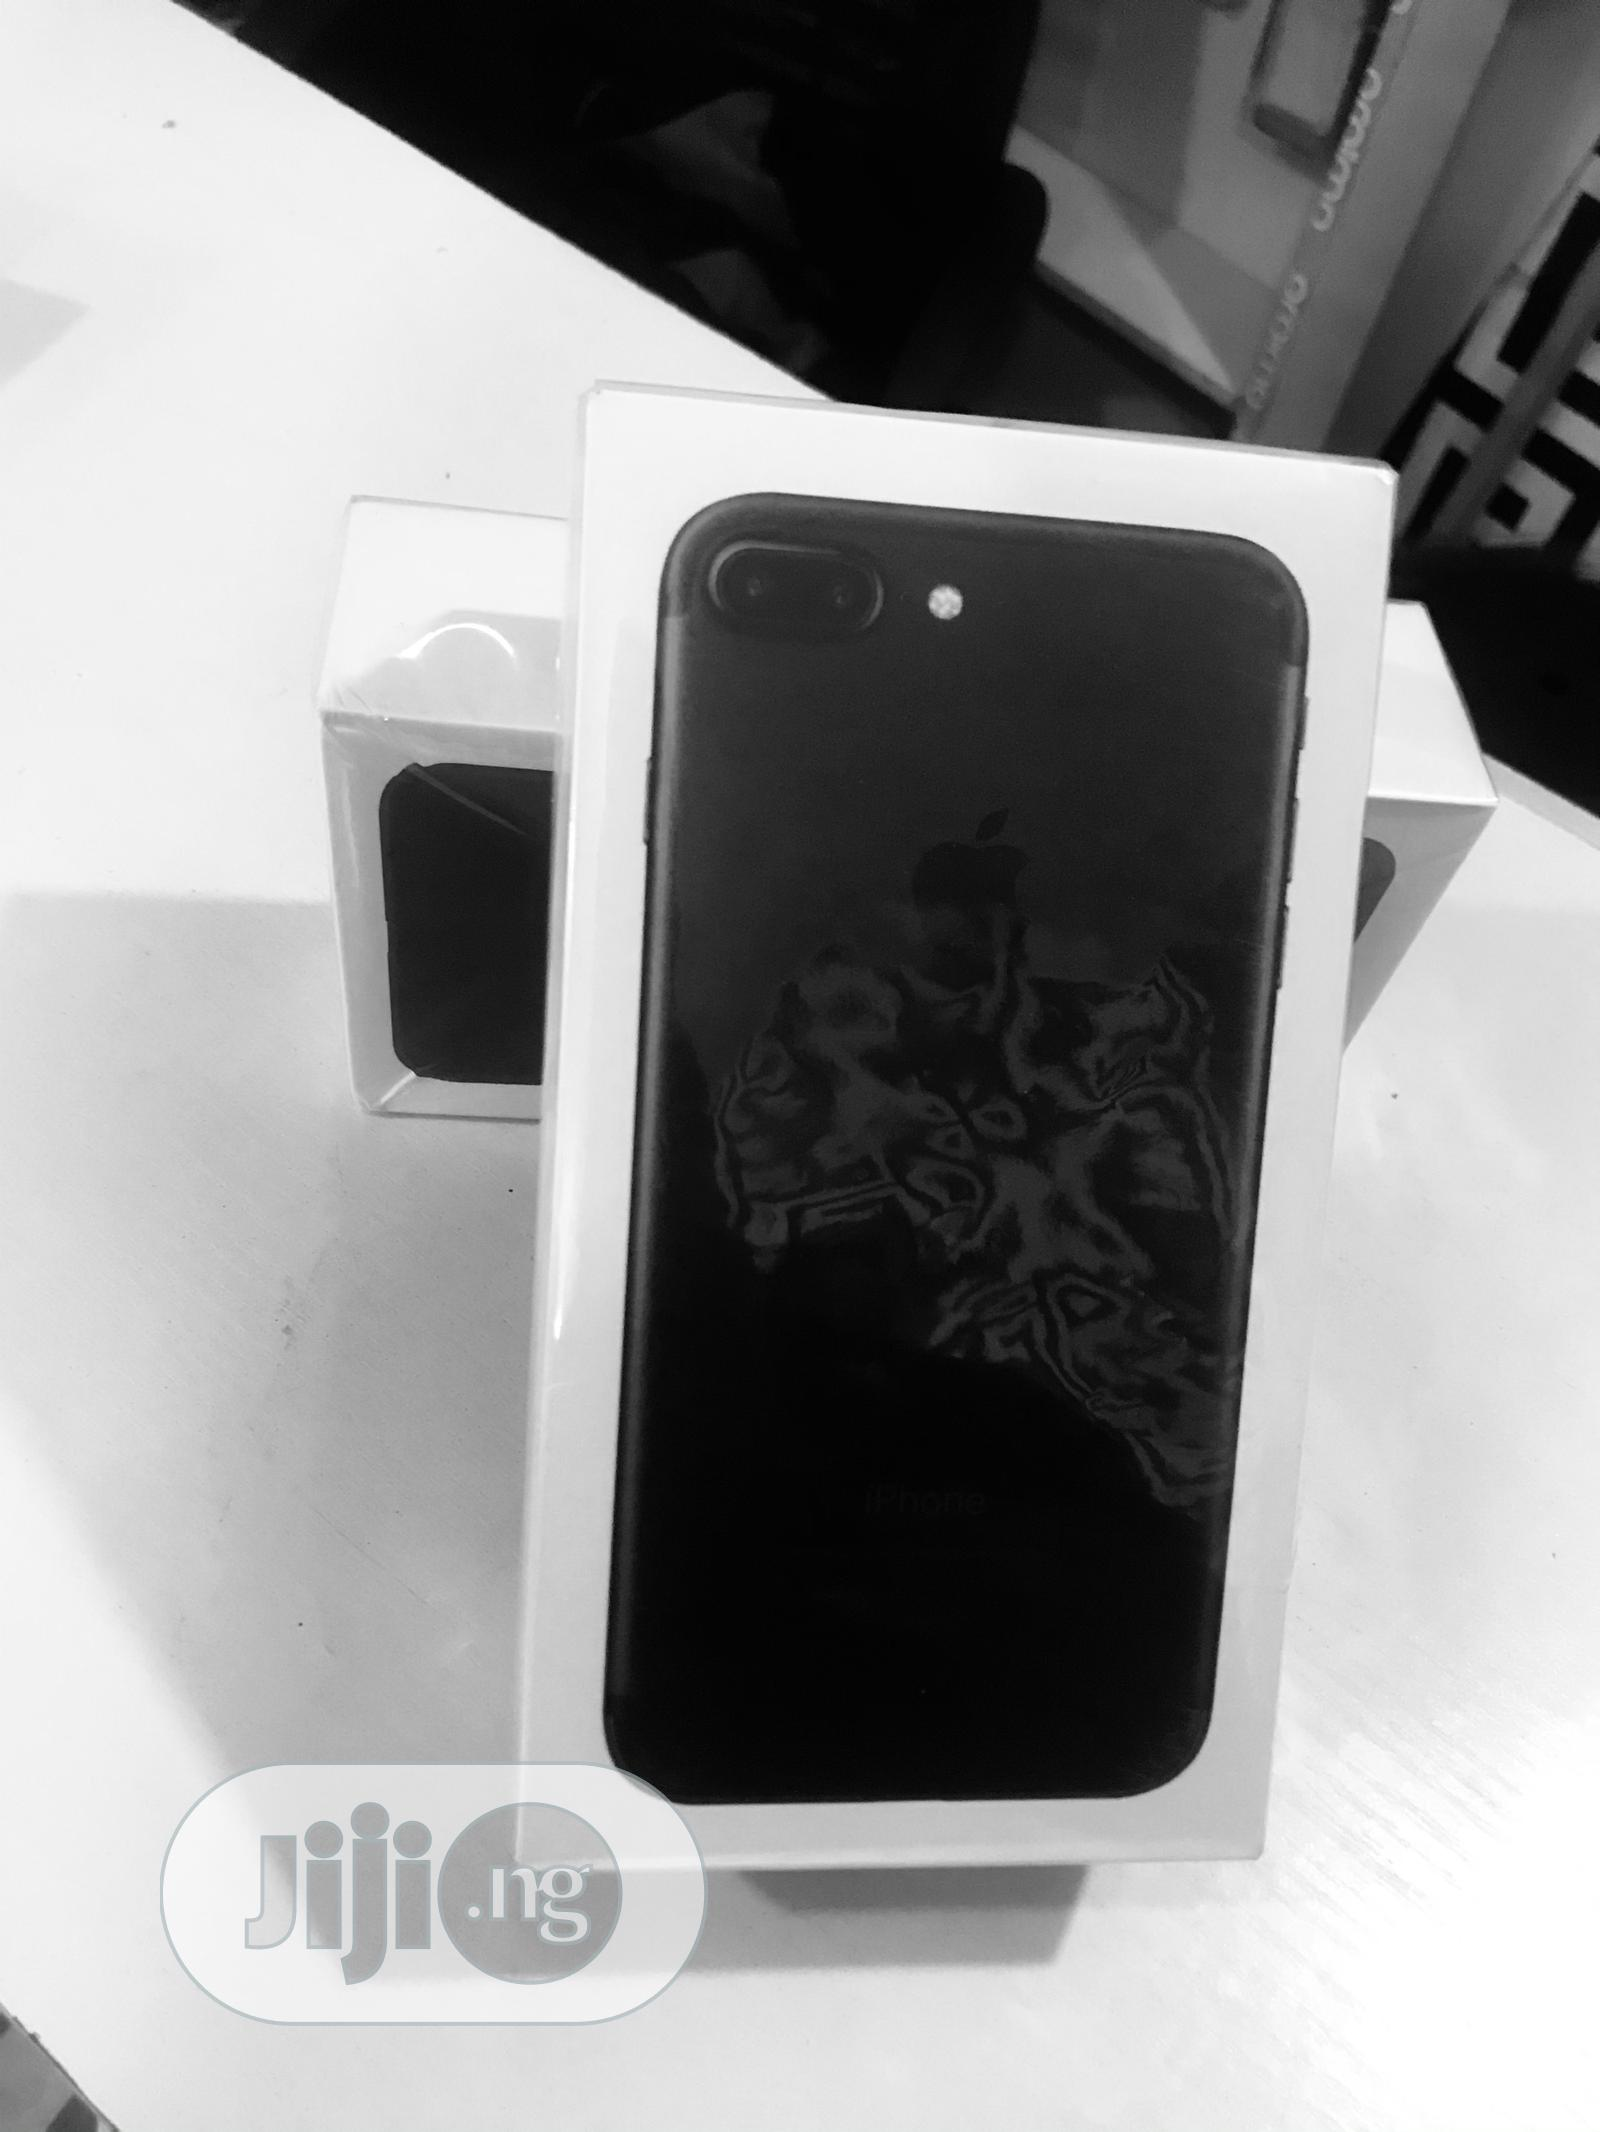 New Apple iPhone 7 Plus 32 GB Black   Mobile Phones for sale in Benin City, Edo State, Nigeria